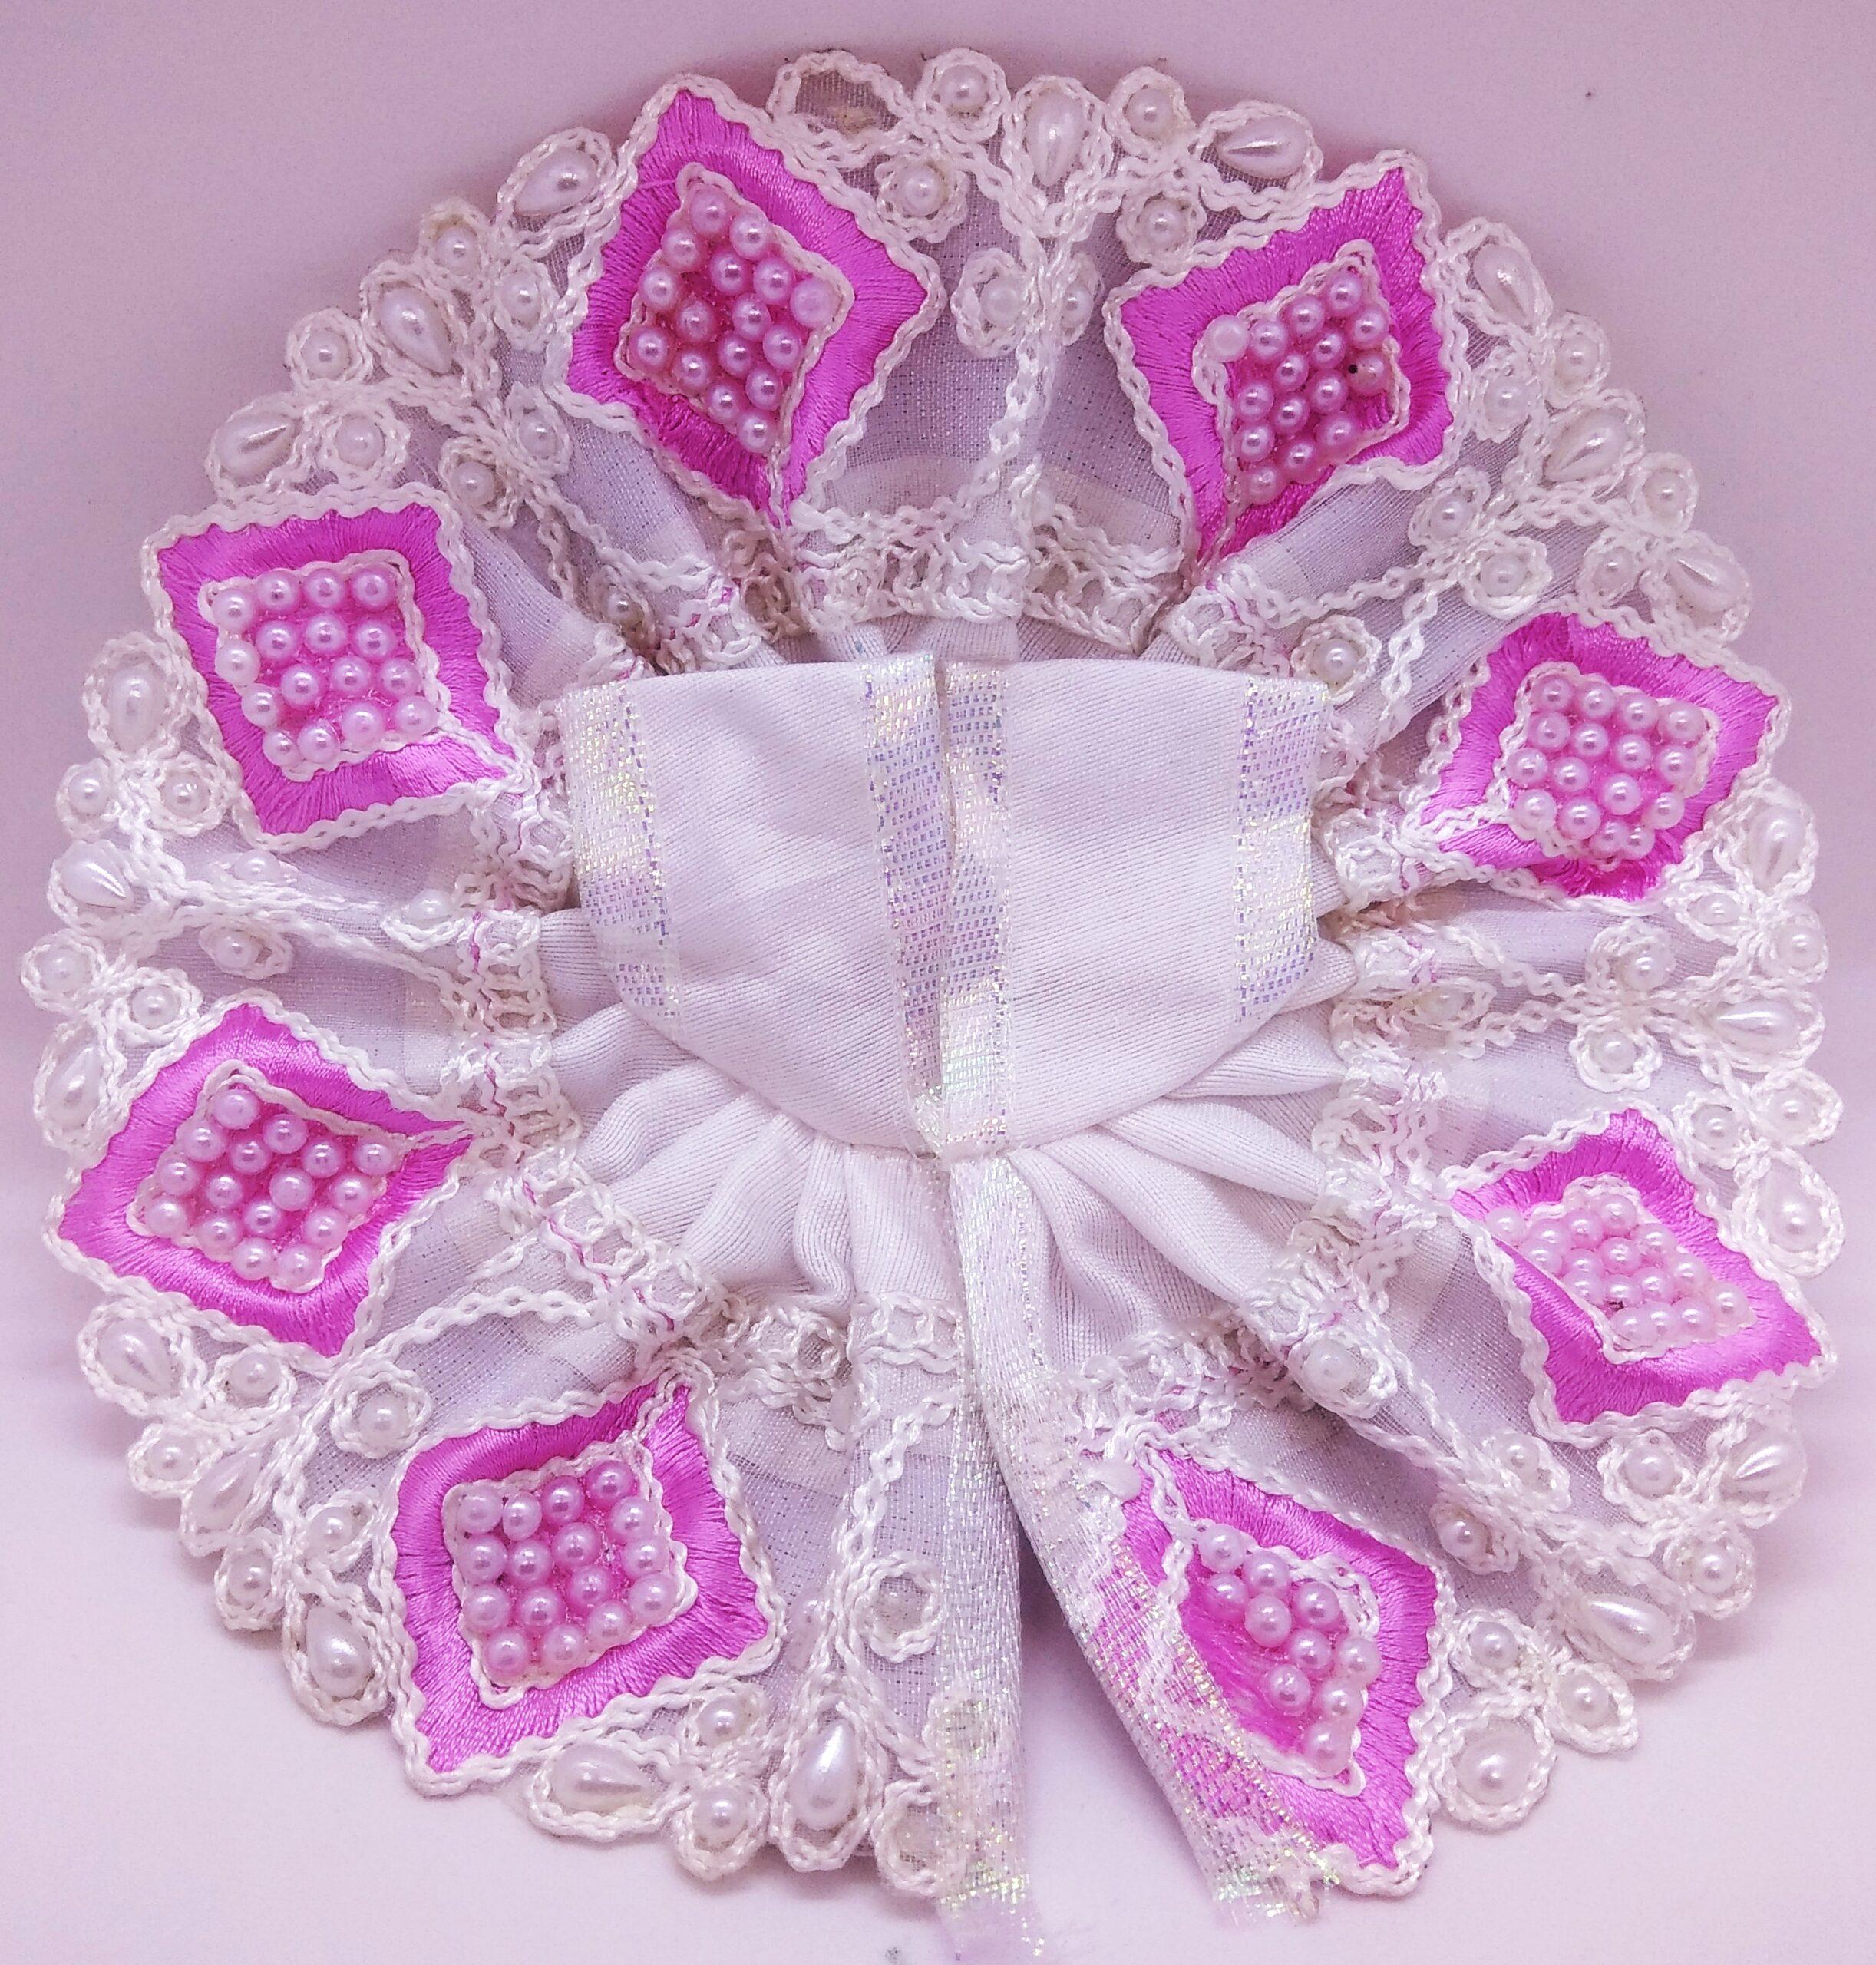 Laddu gopal special dress